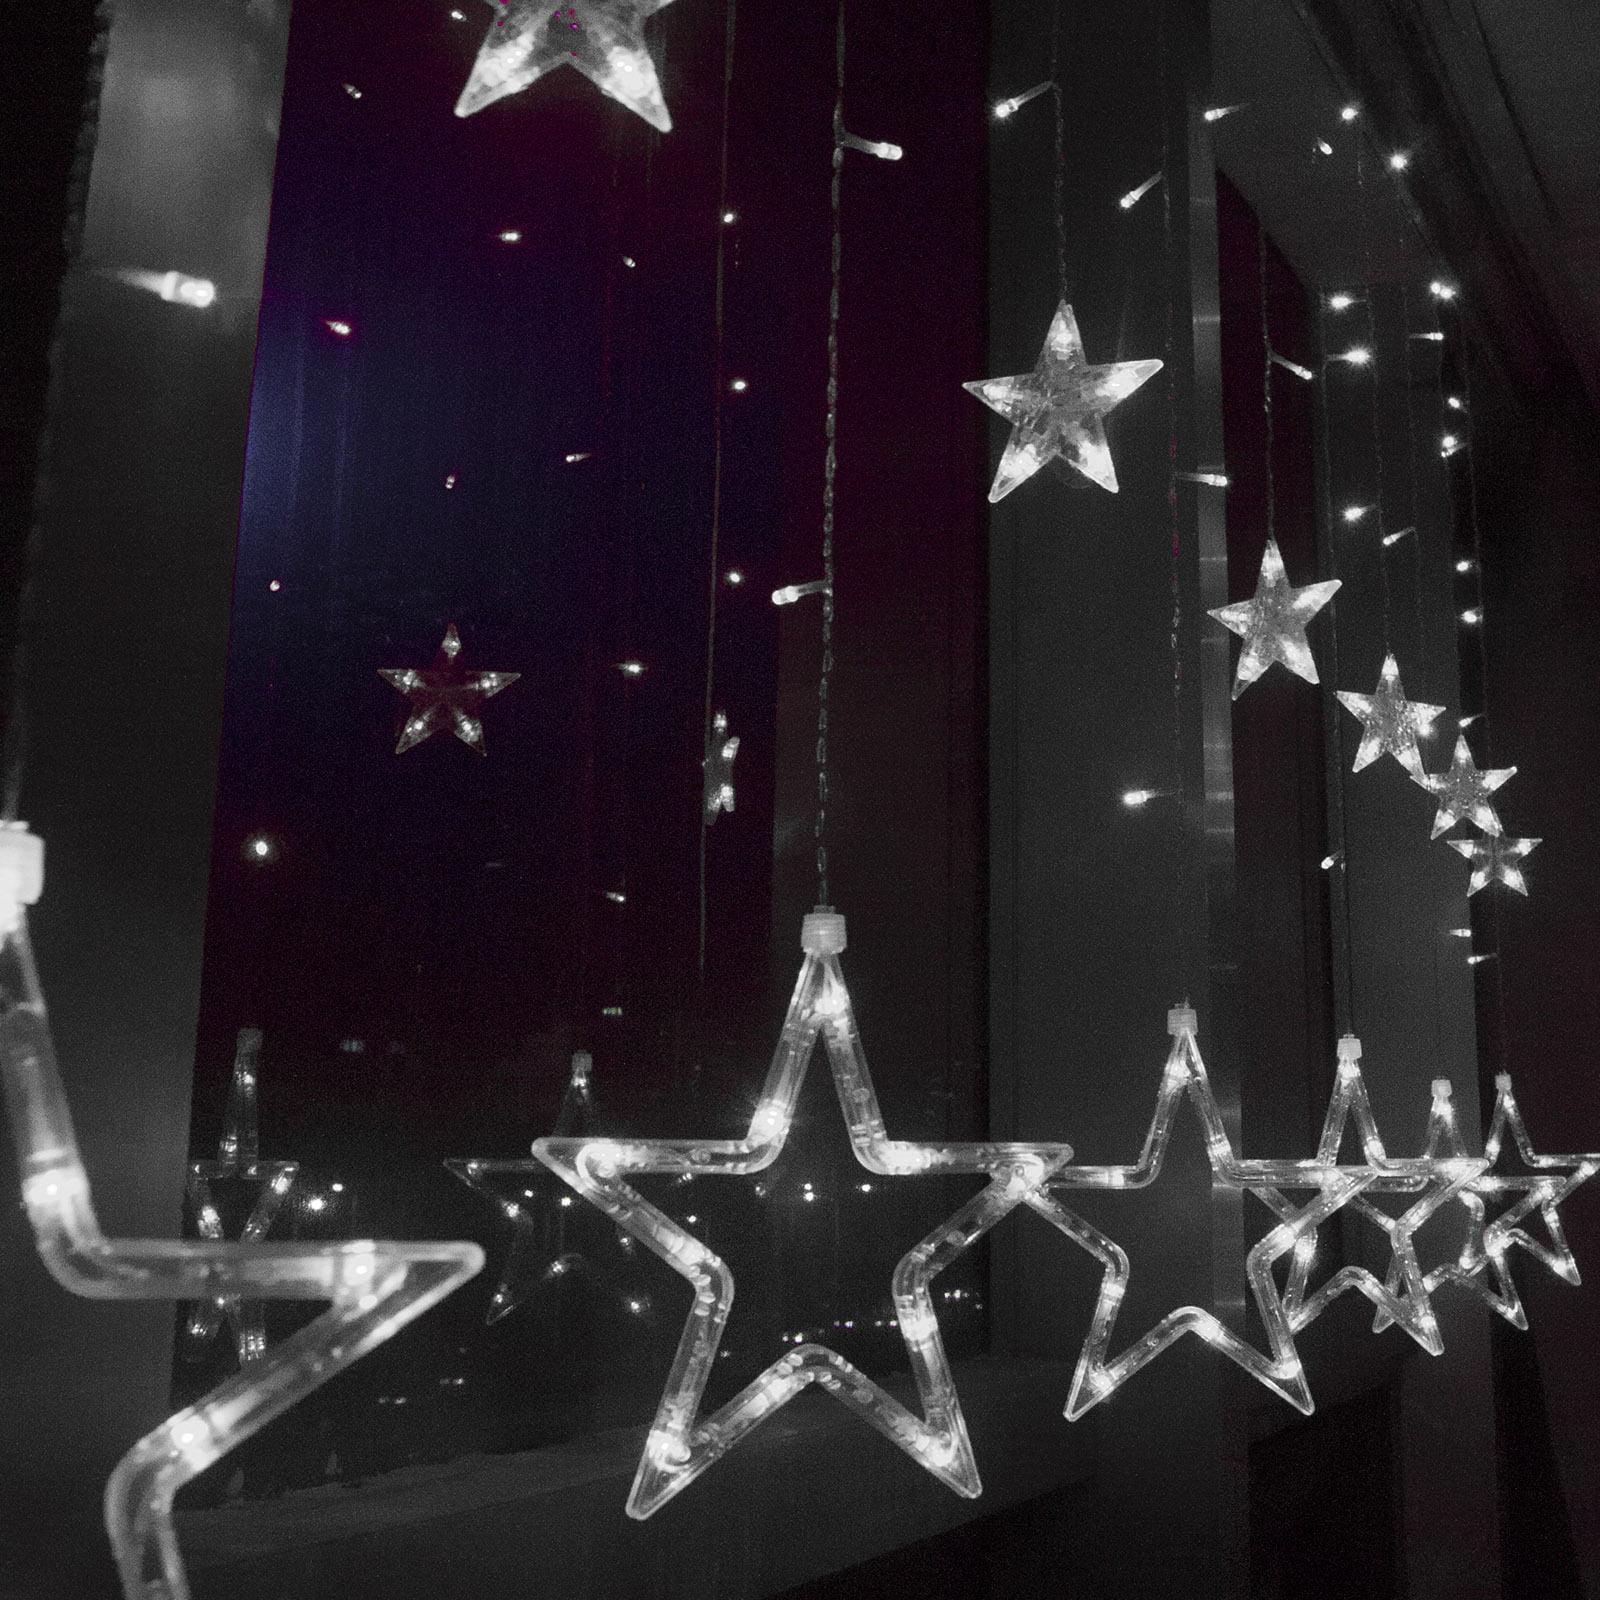 Hanging Star Curtain Lights - Curtain Designs